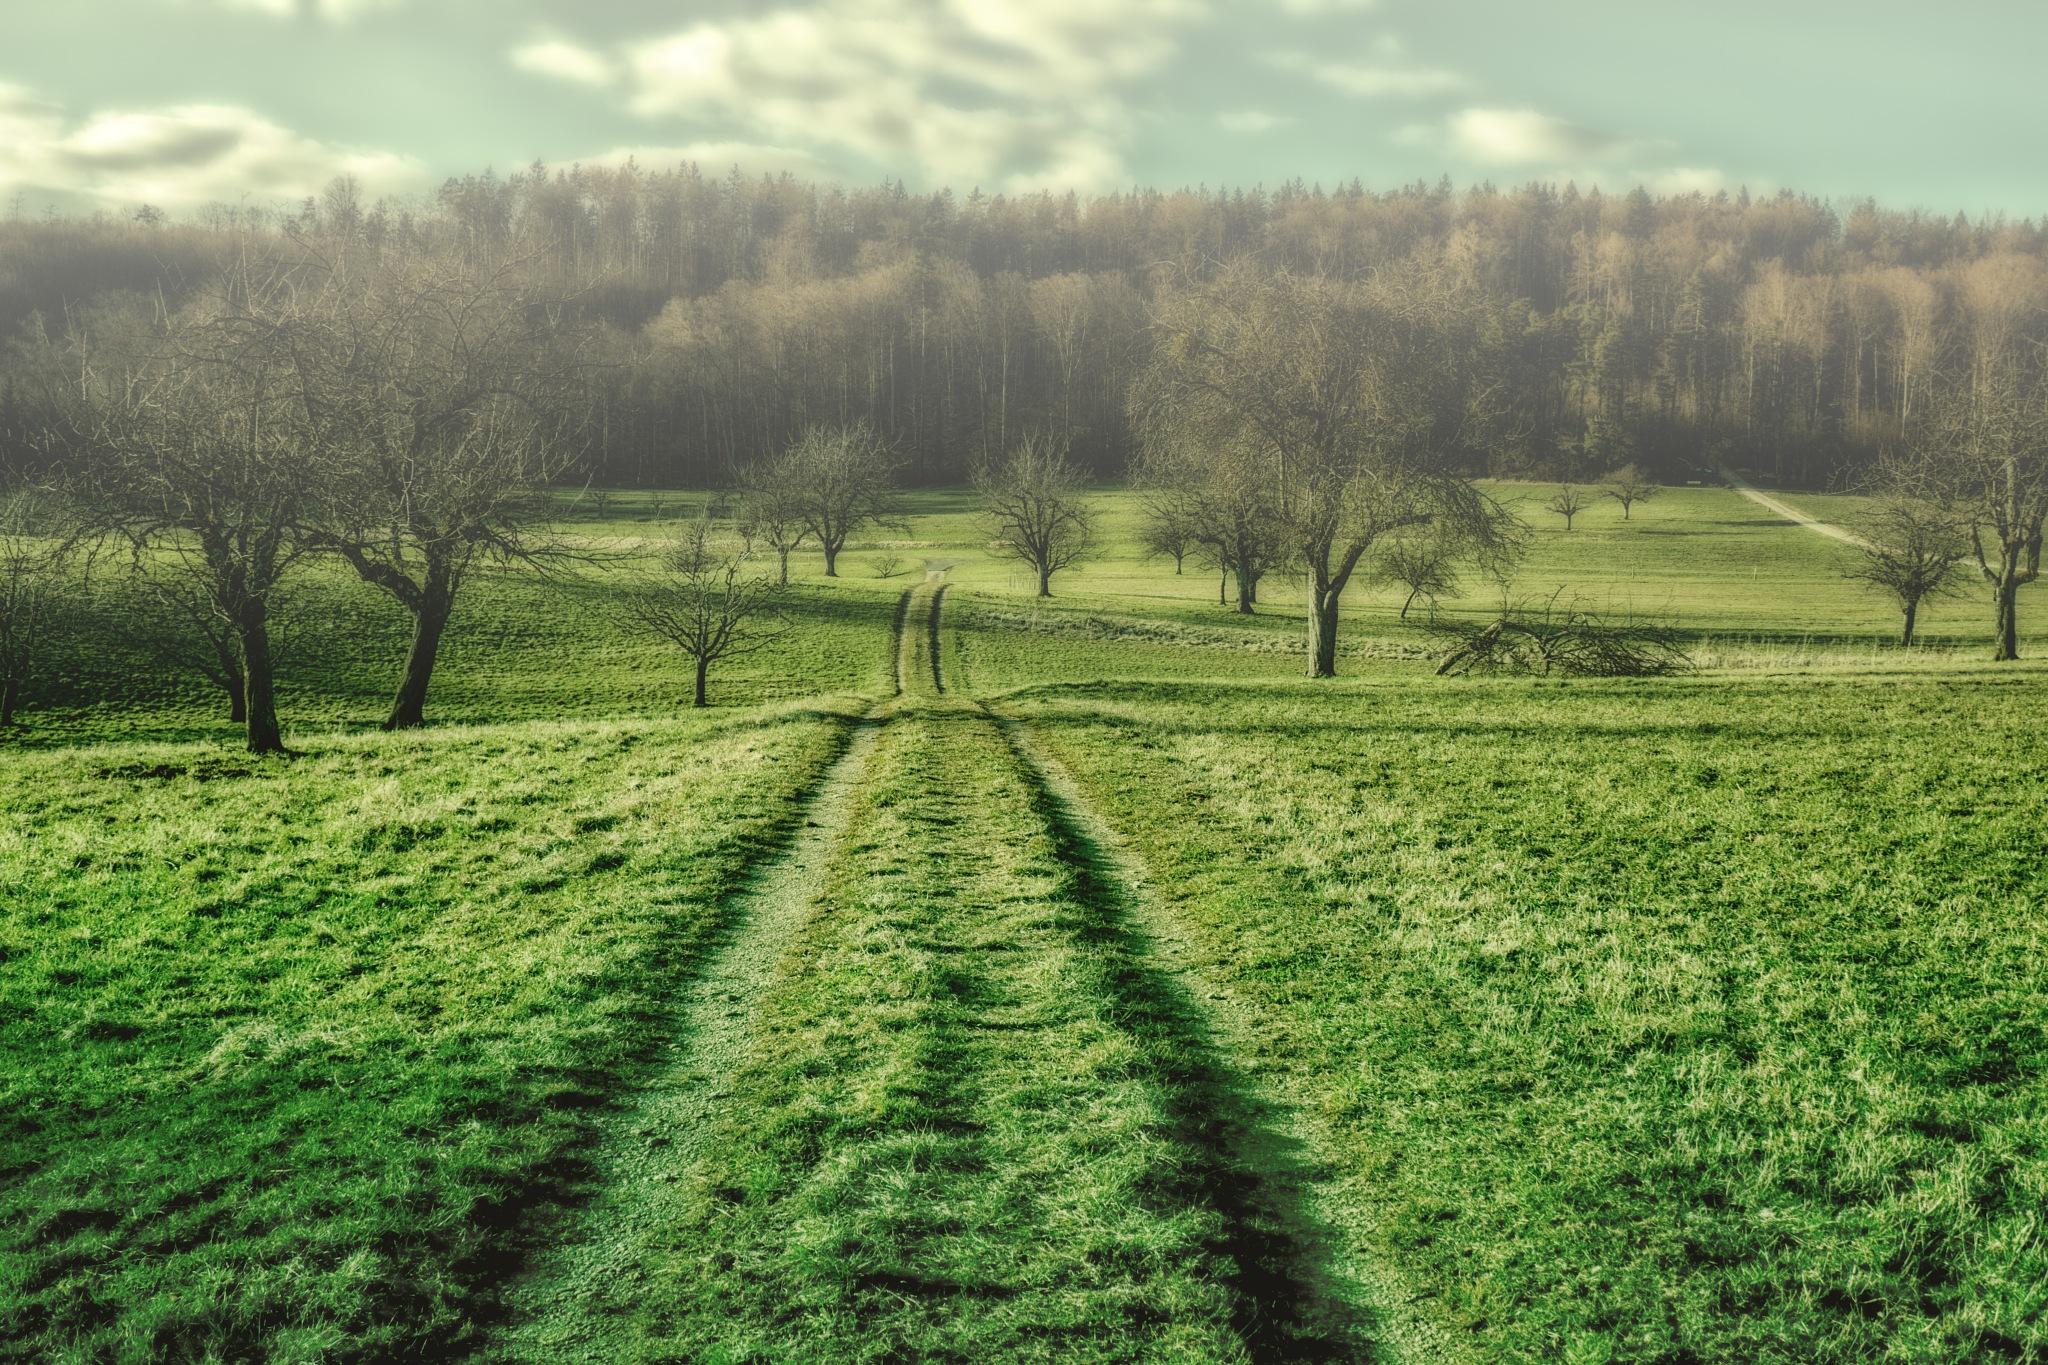 Landschafts-Experiment by Hansjuerg Buehler